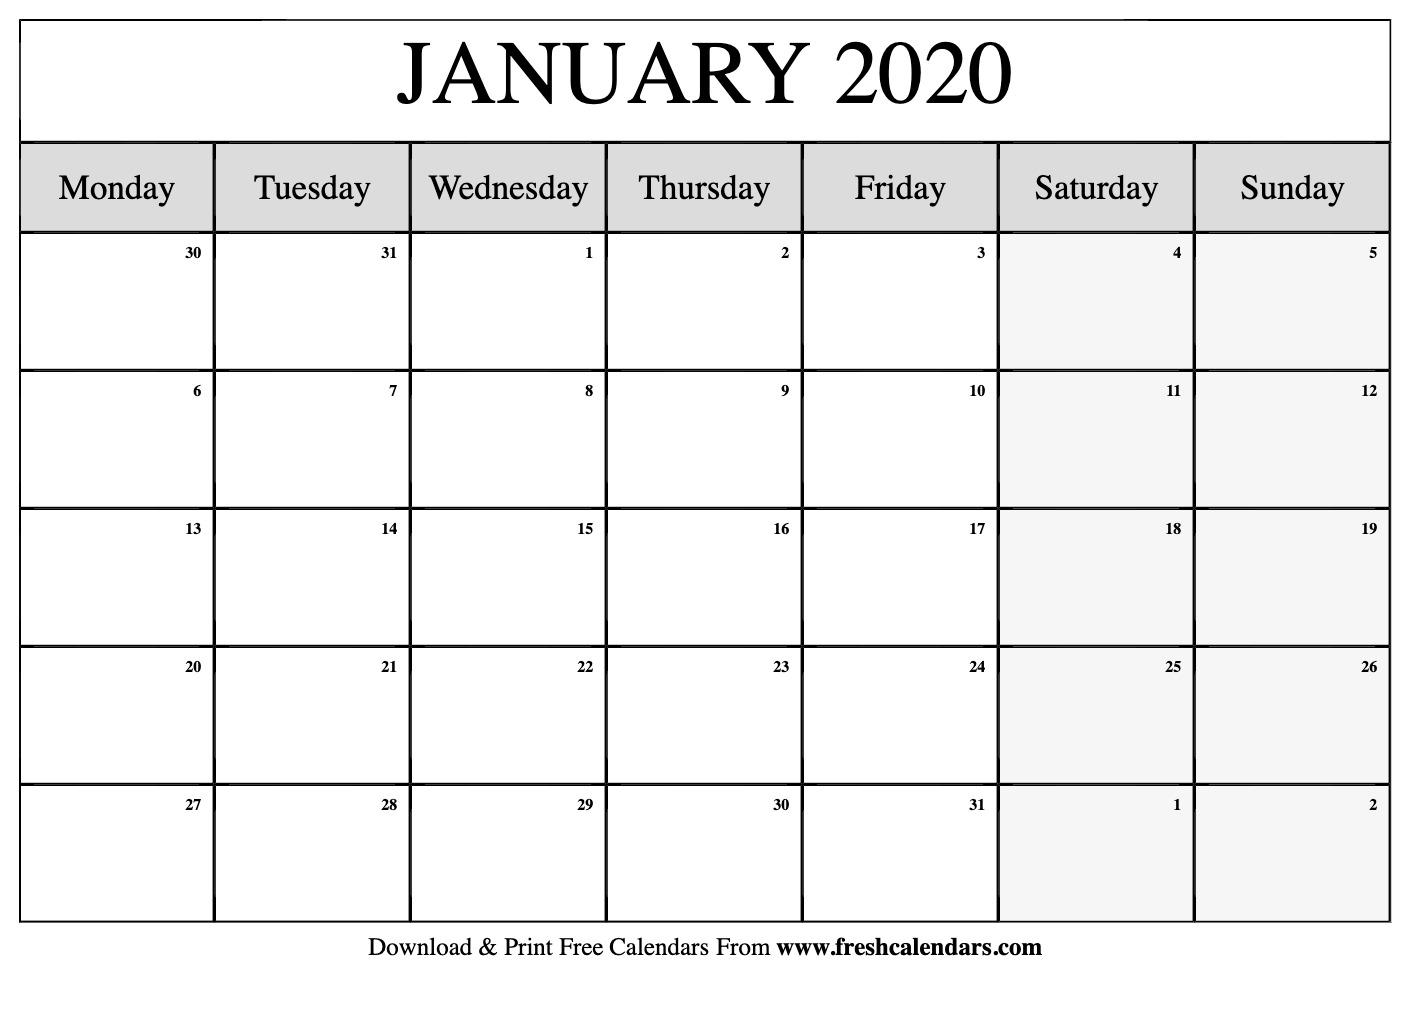 Free Printable January 2020 Calendar regarding January 2020 Calendar Starting Monday